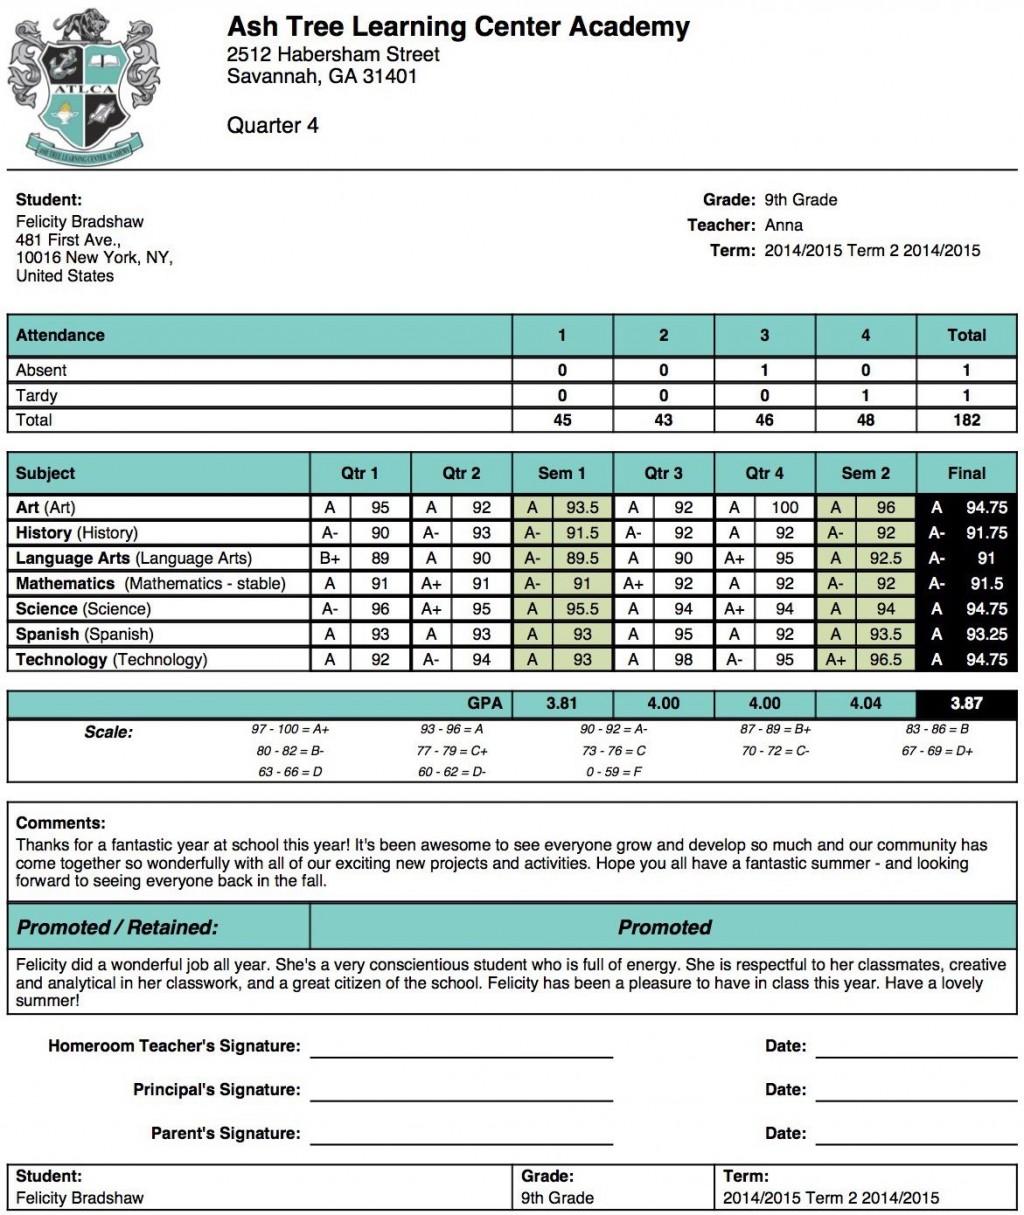 002 Marvelou Junior High School Report Card Template Design Large